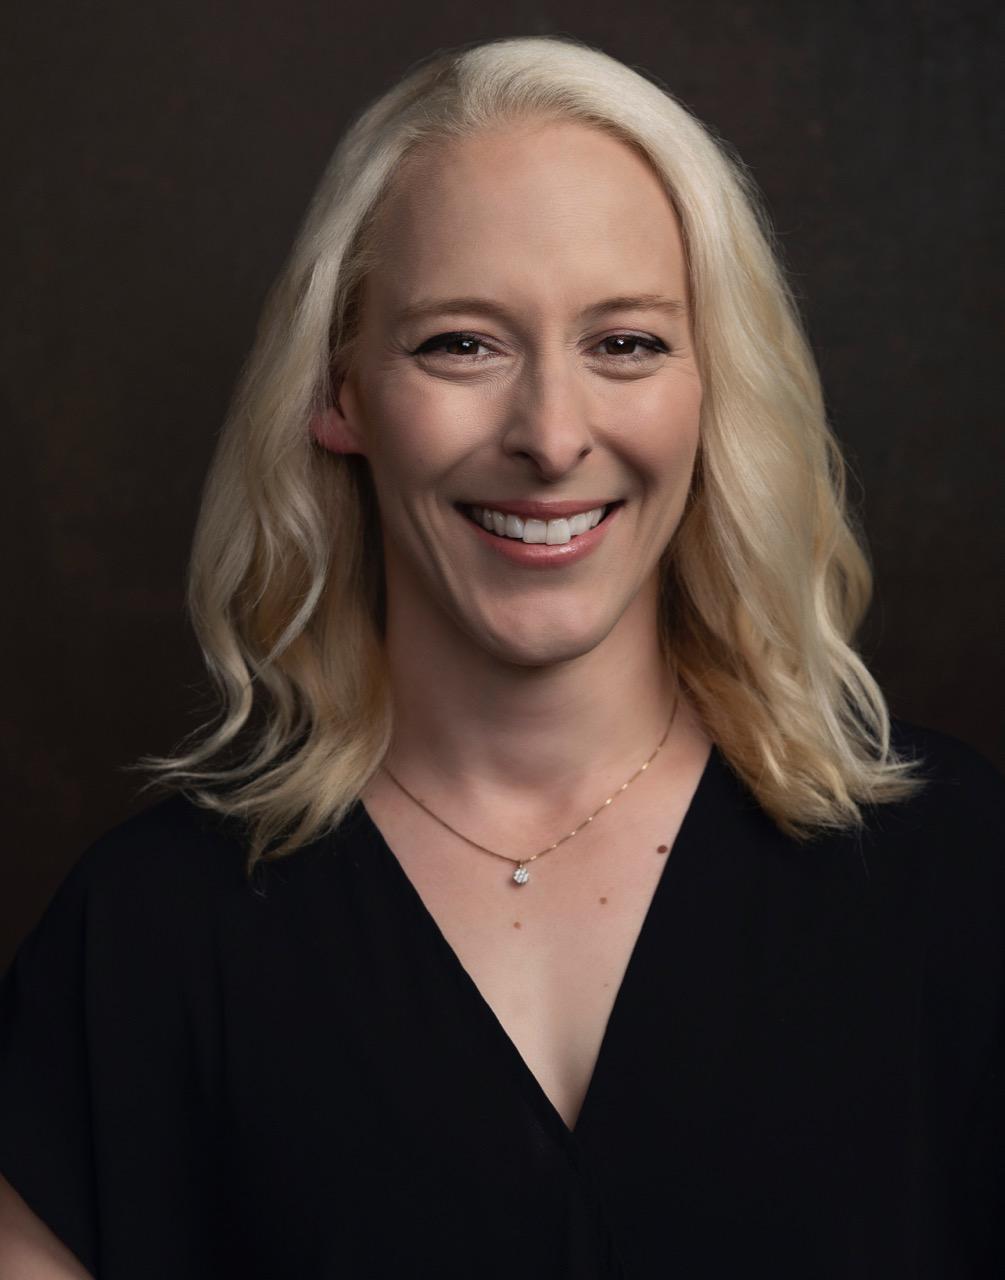 Kristen Rutherford